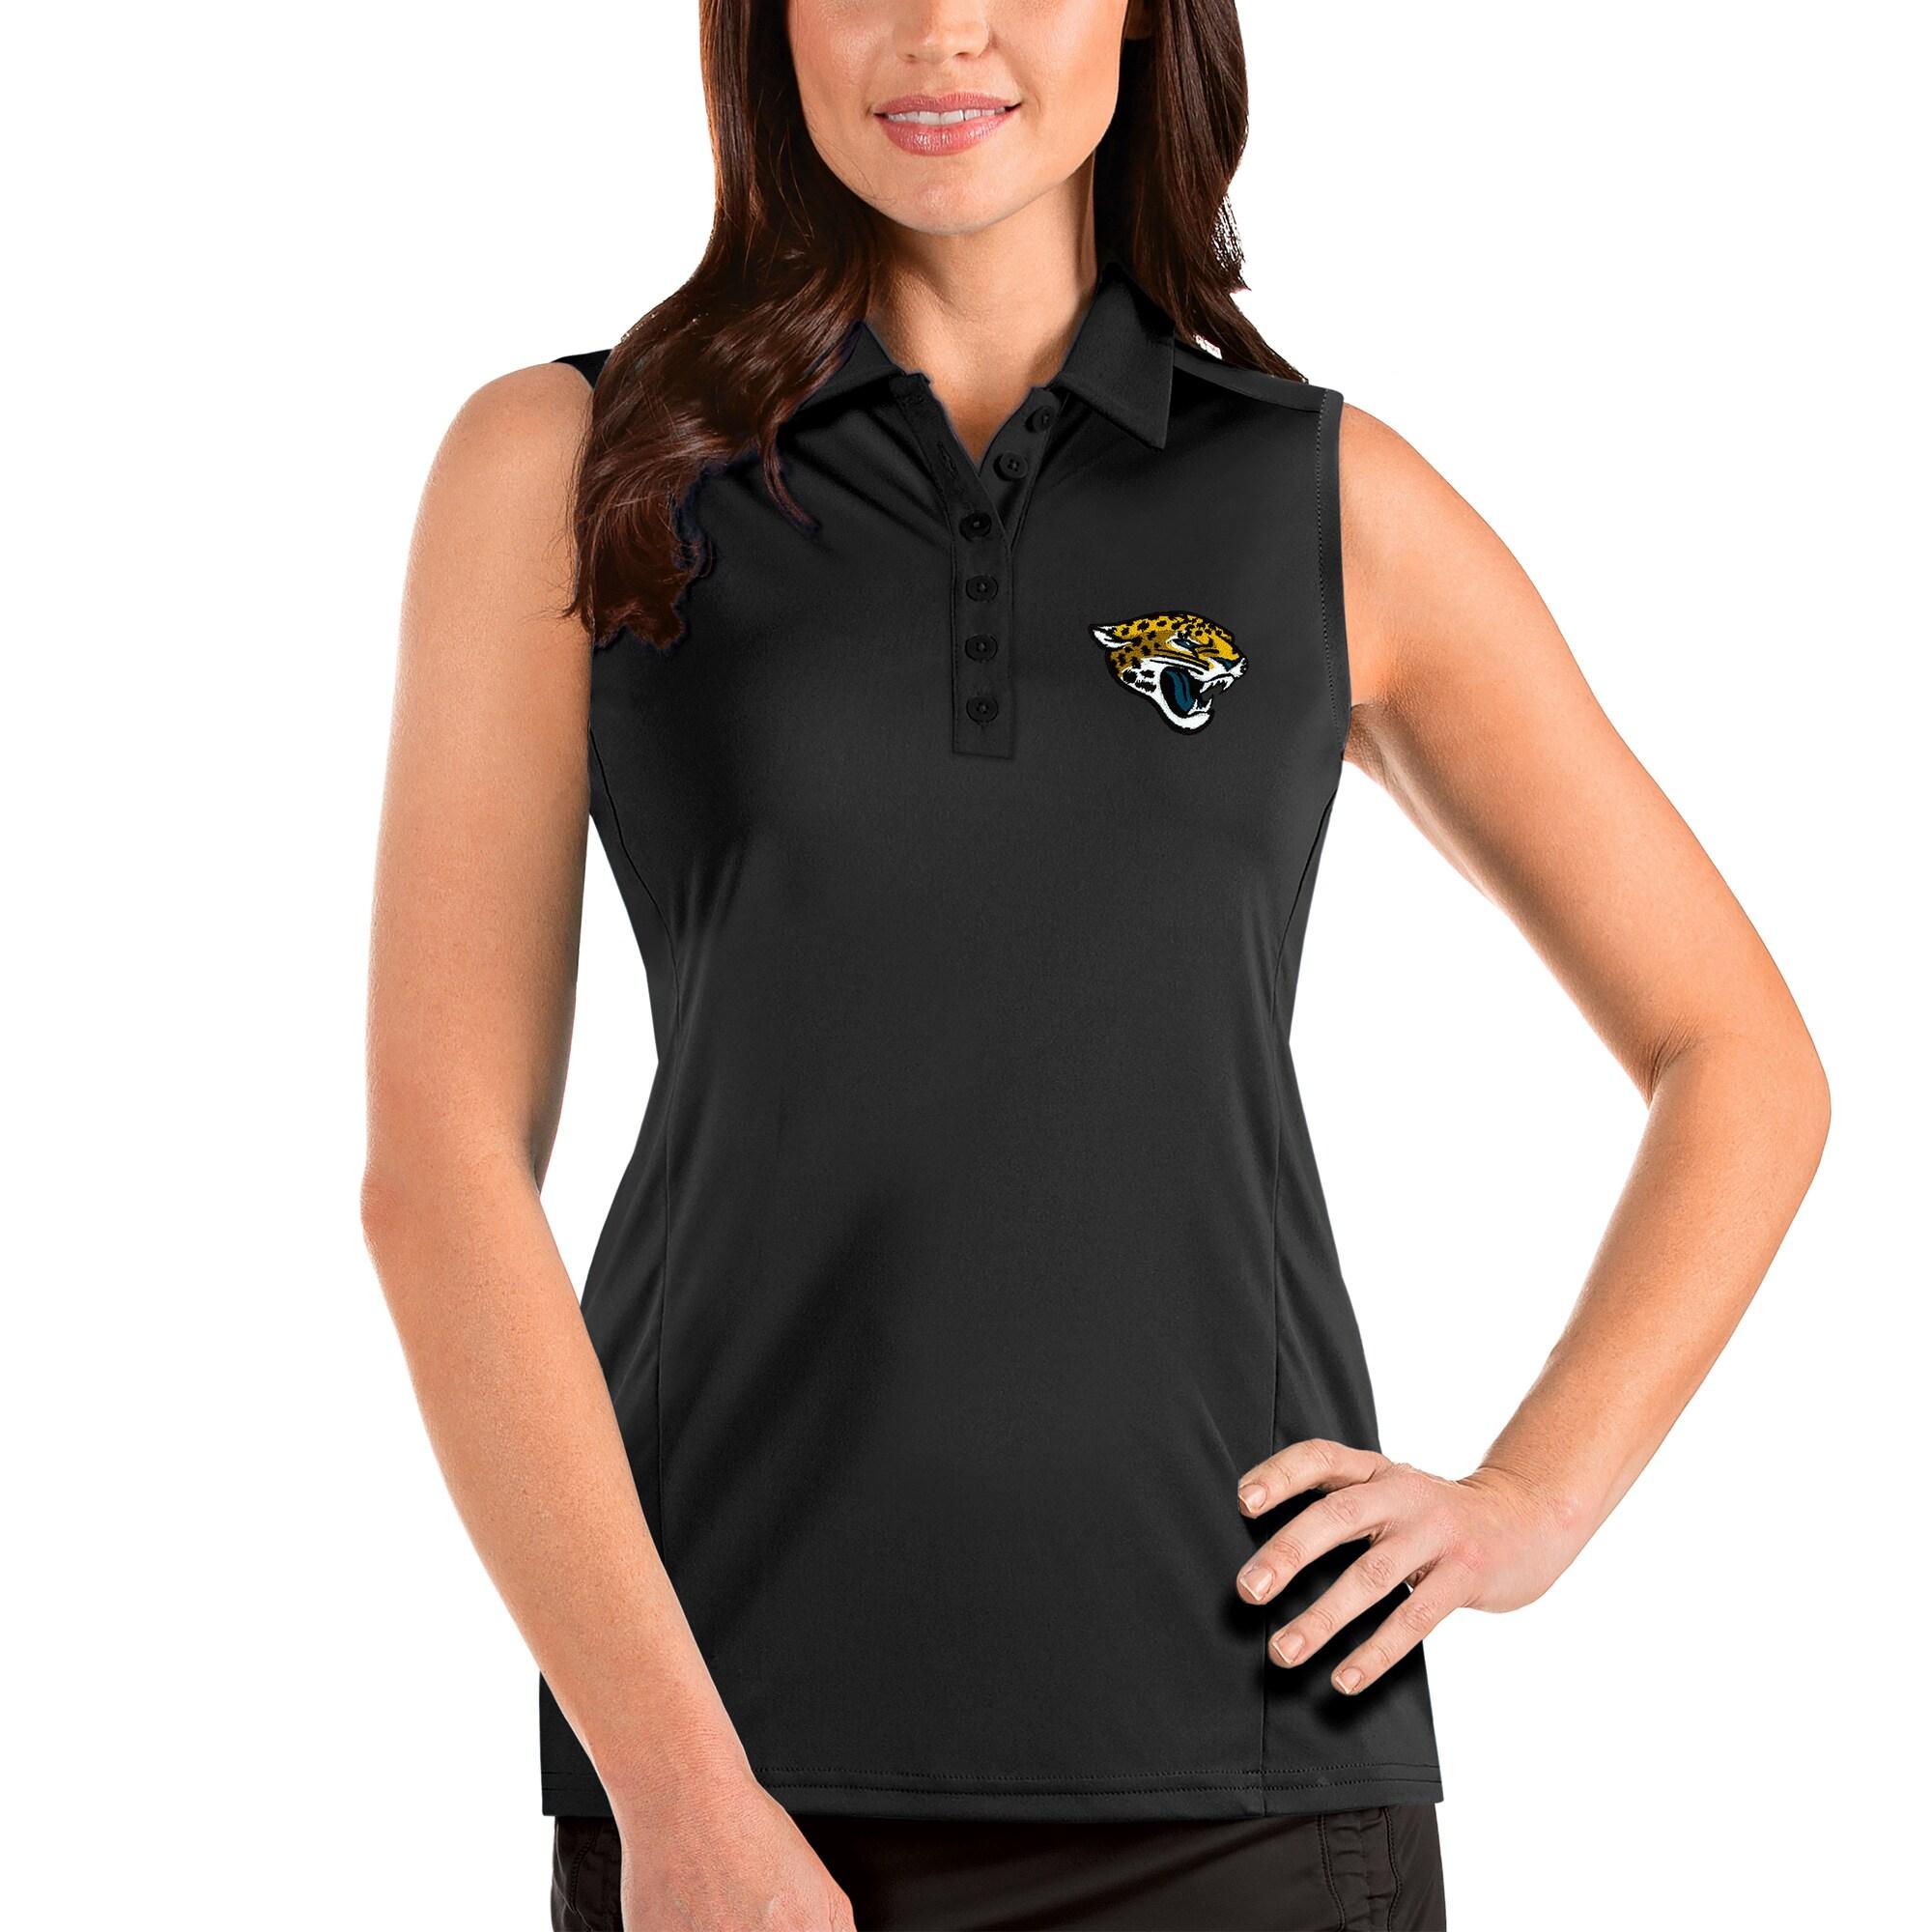 Jacksonville Jaguars Antigua Women's Sleeveless Tribute Polo - Black